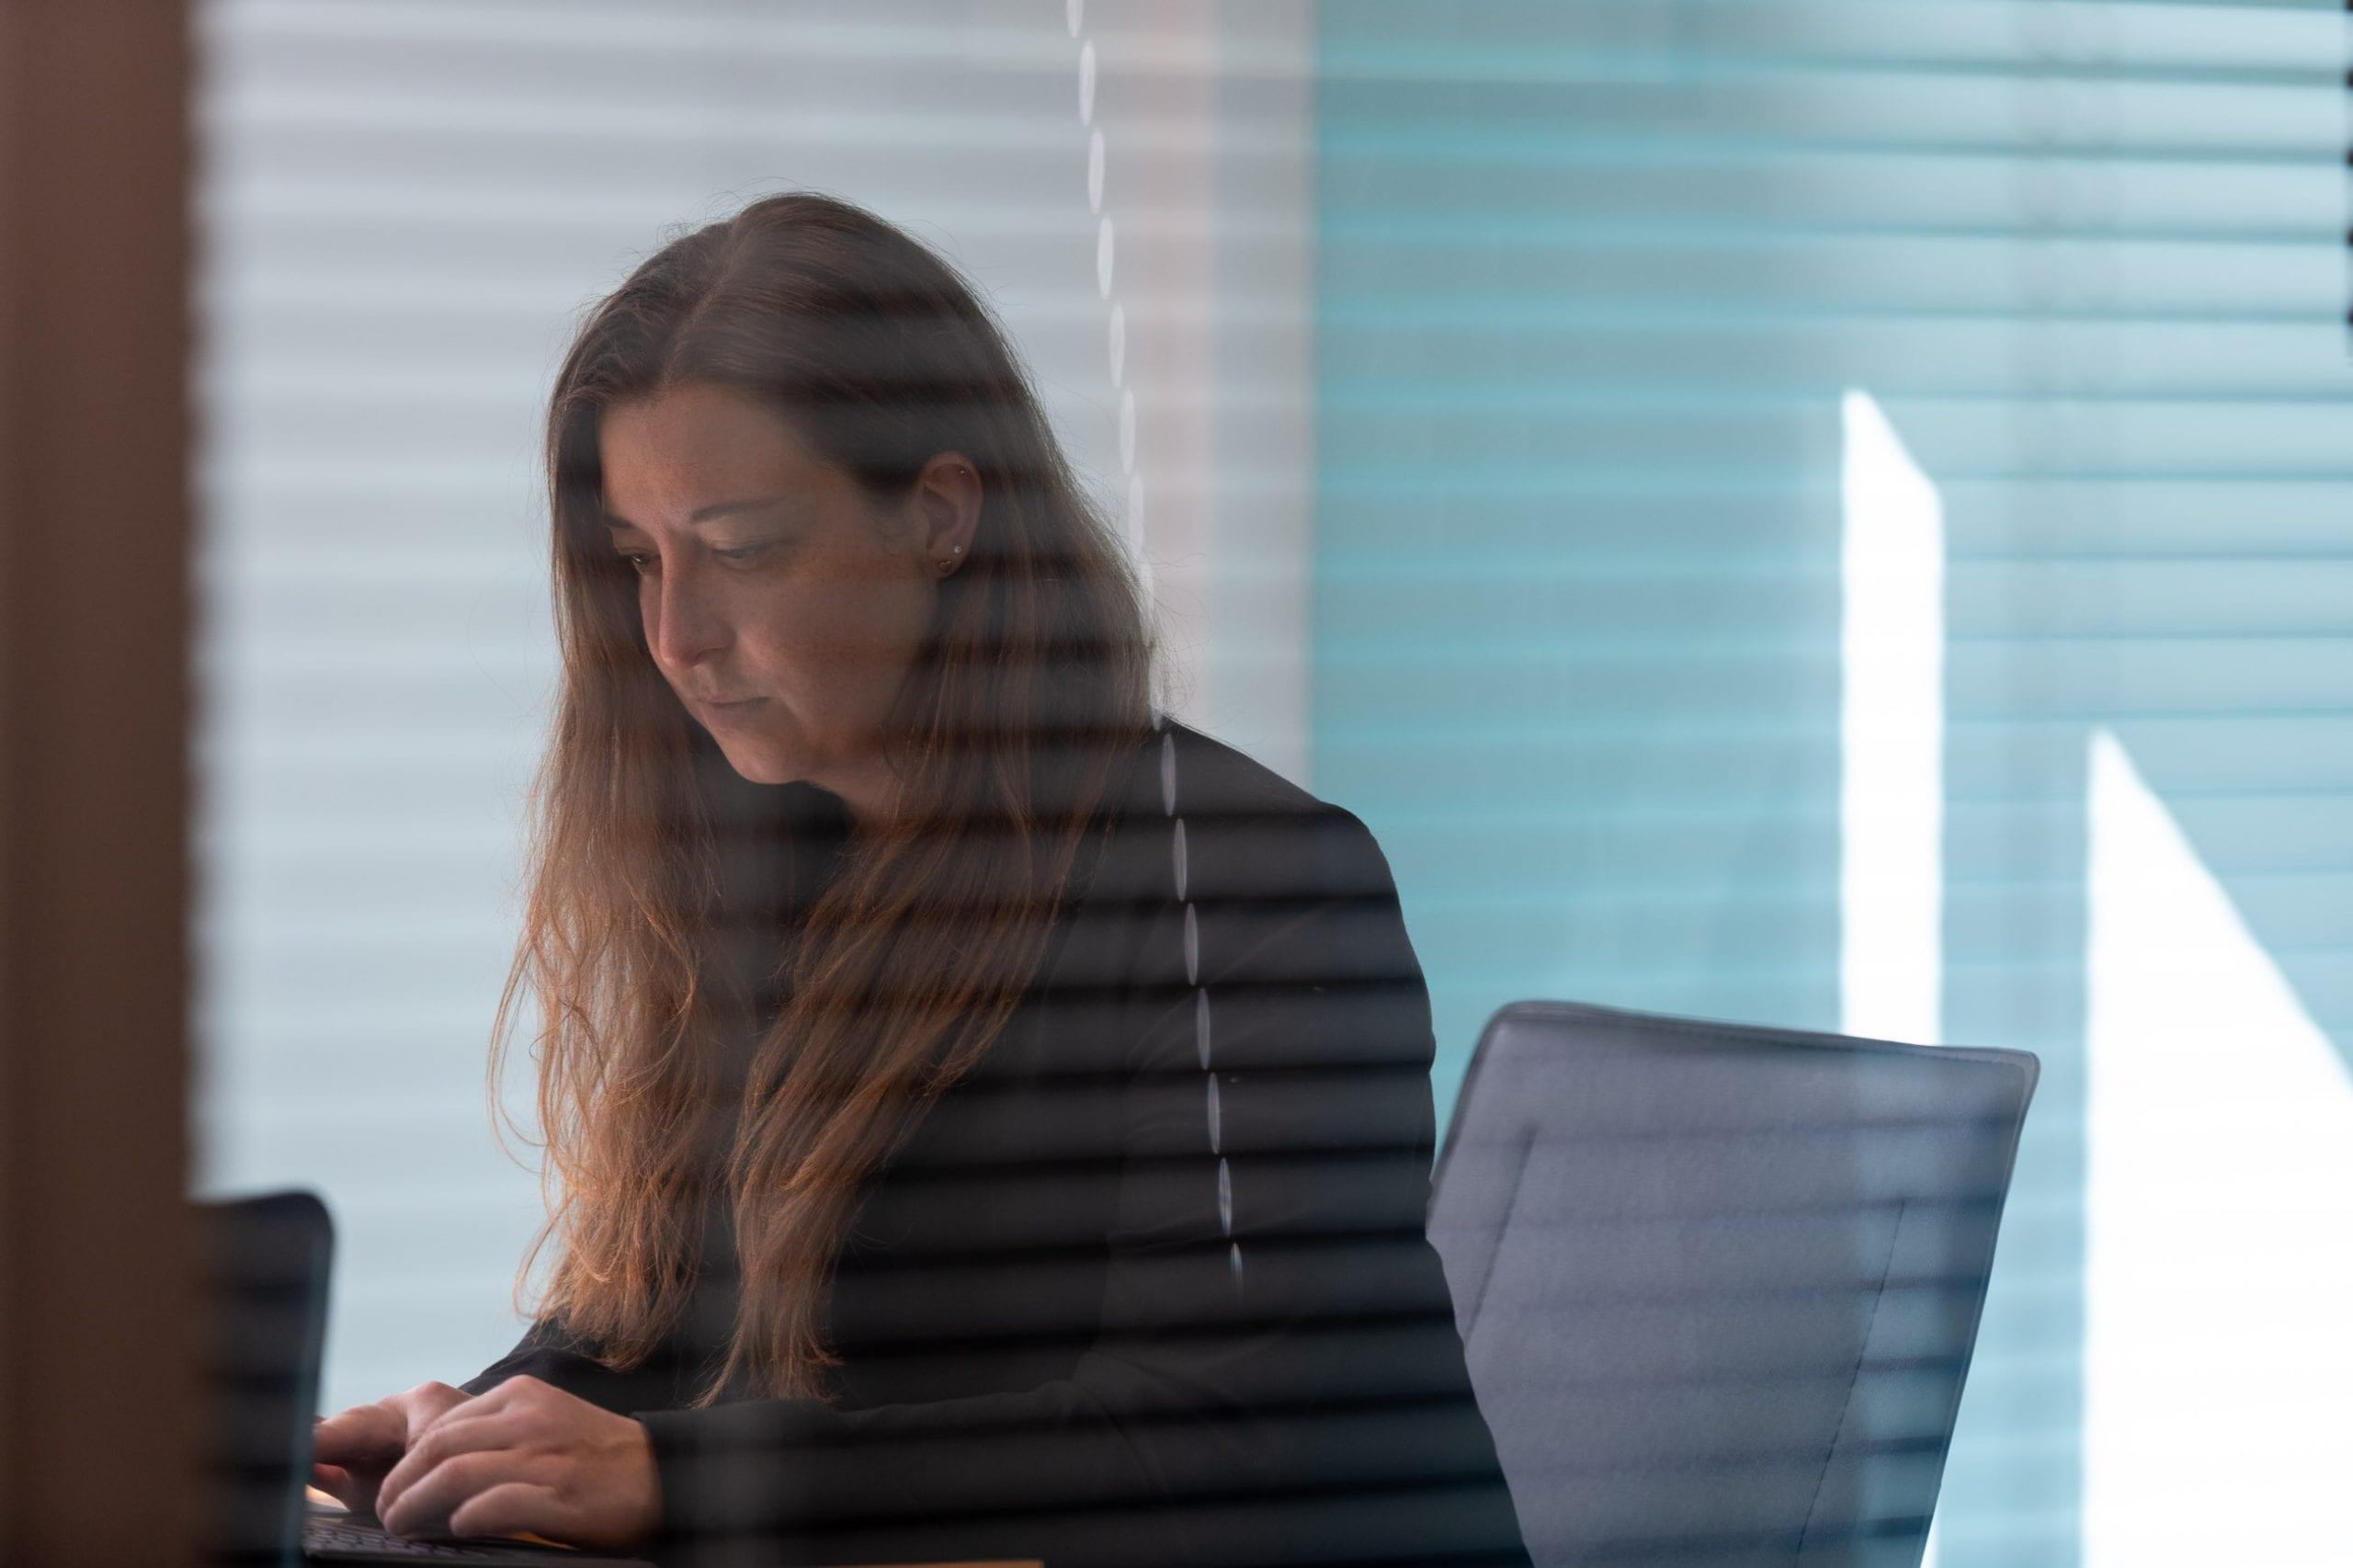 record divorce case internal office shot